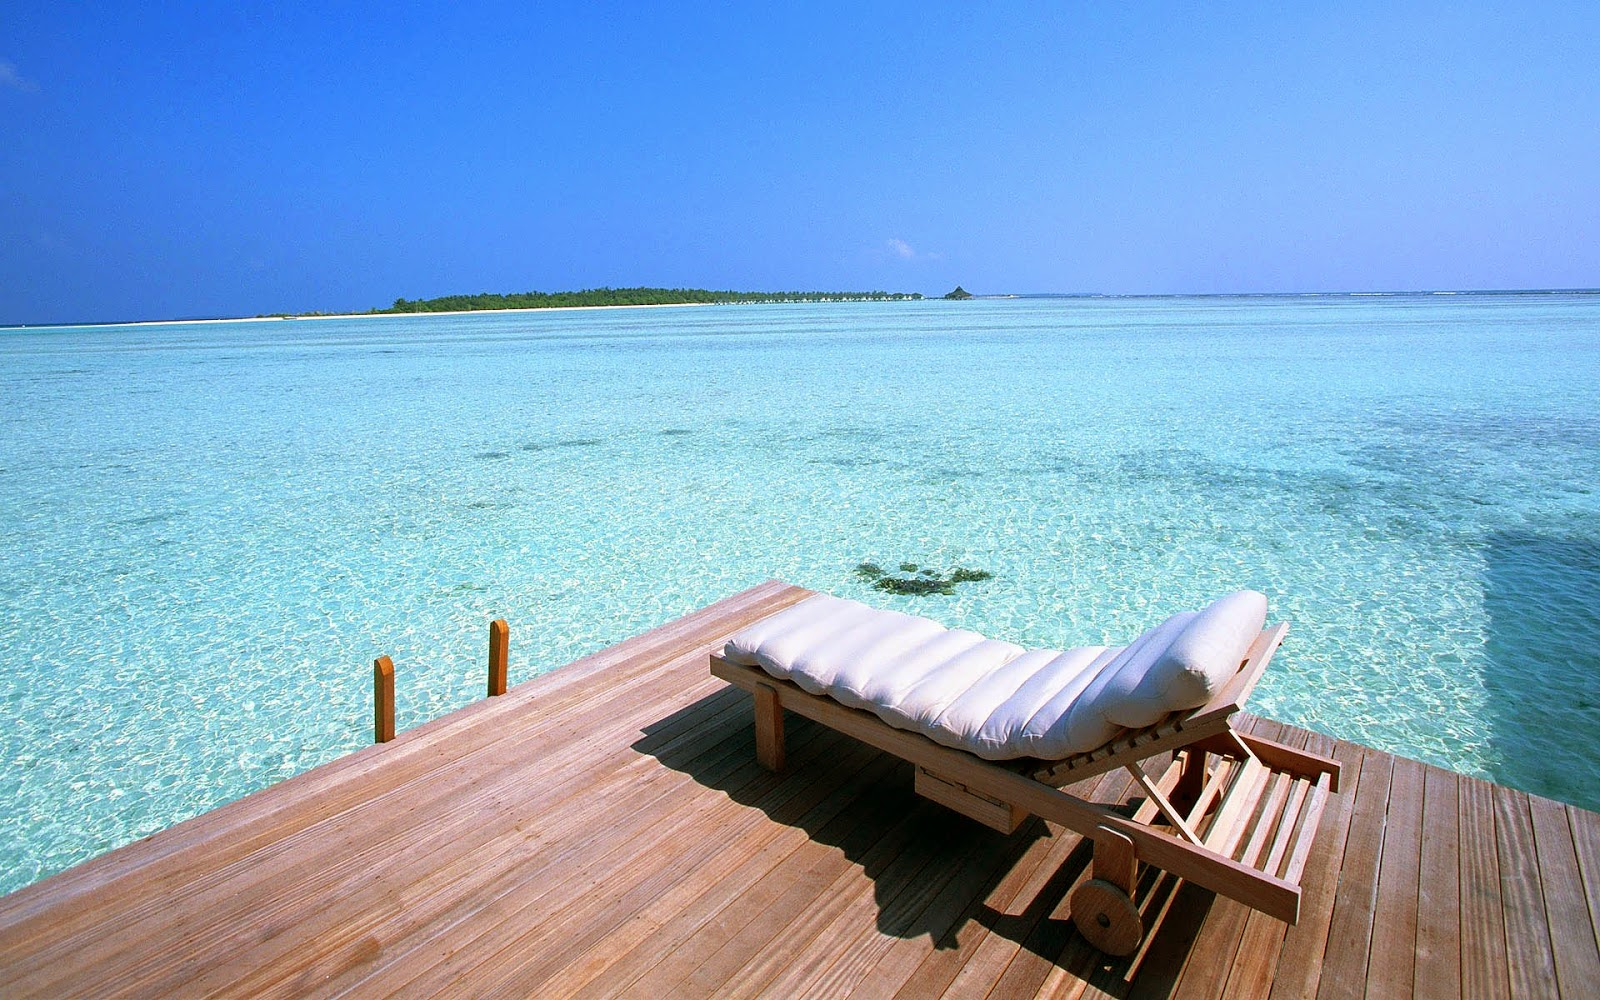 Strandbank eiland en mooie helder blauw water